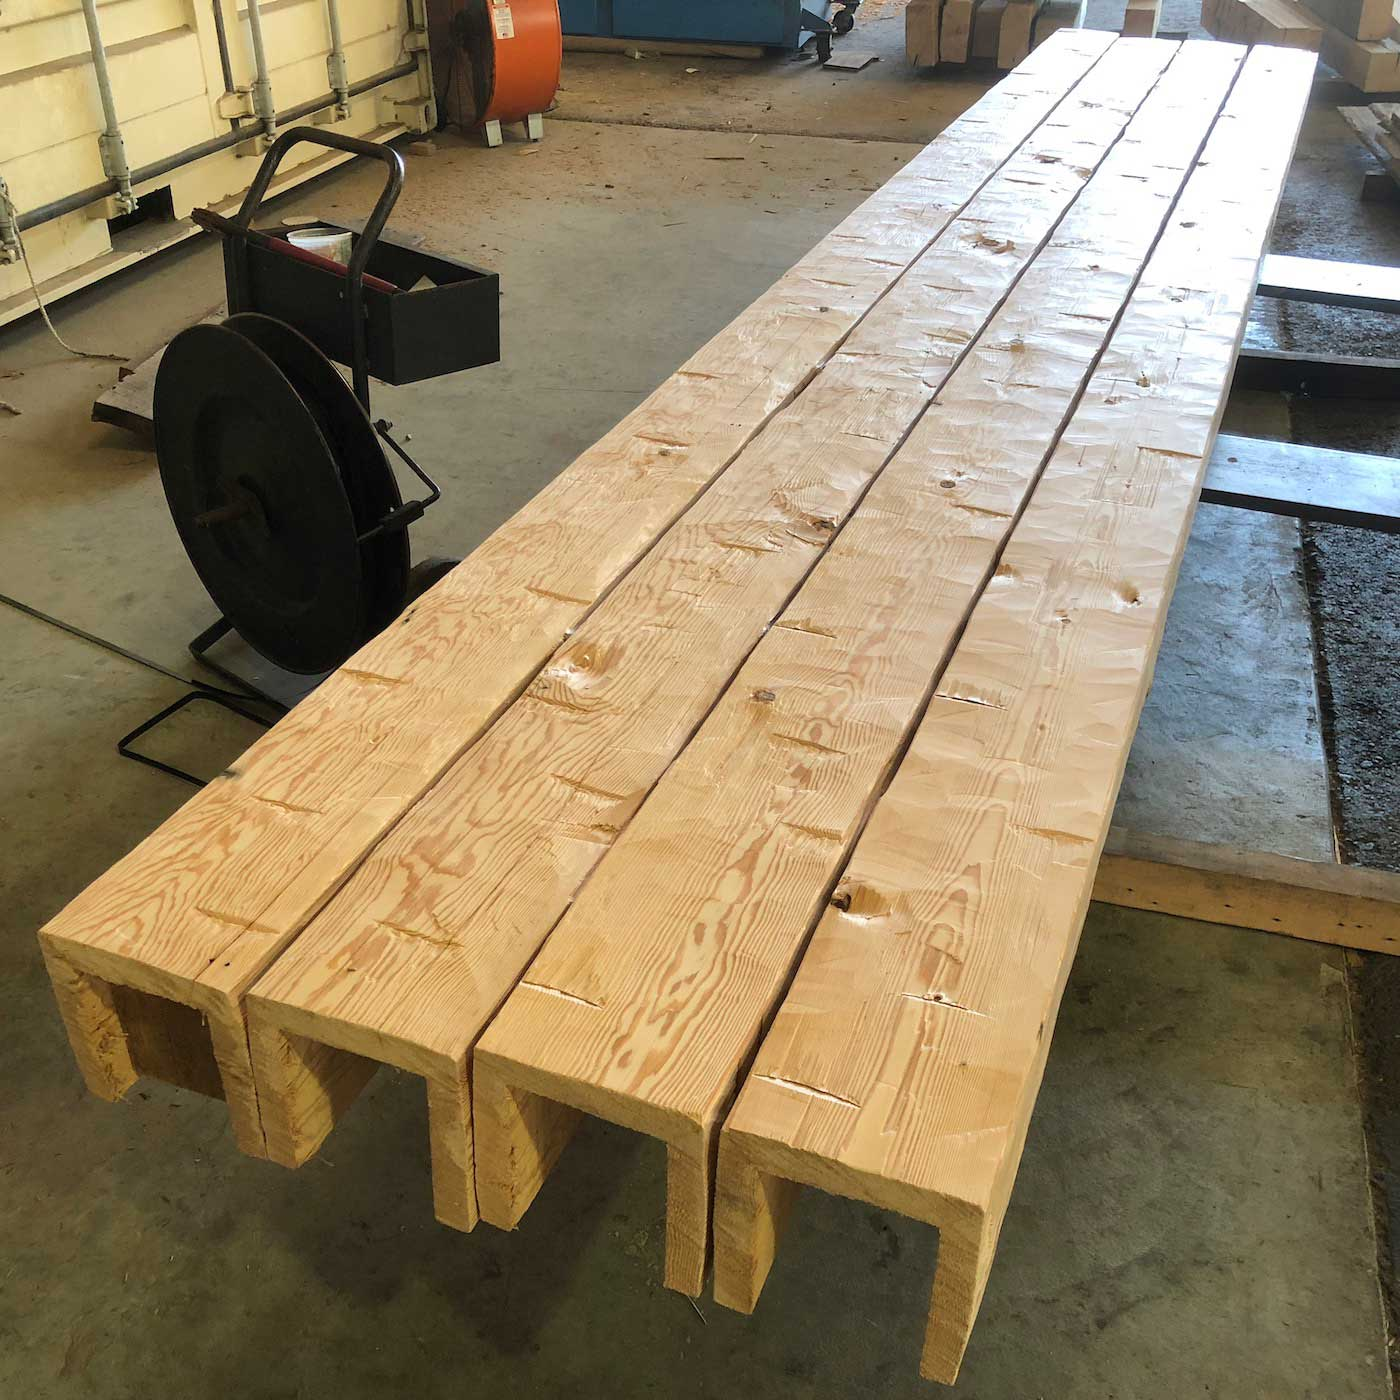 Hand hewn douglas fir box beams - Box Beam Fabrication